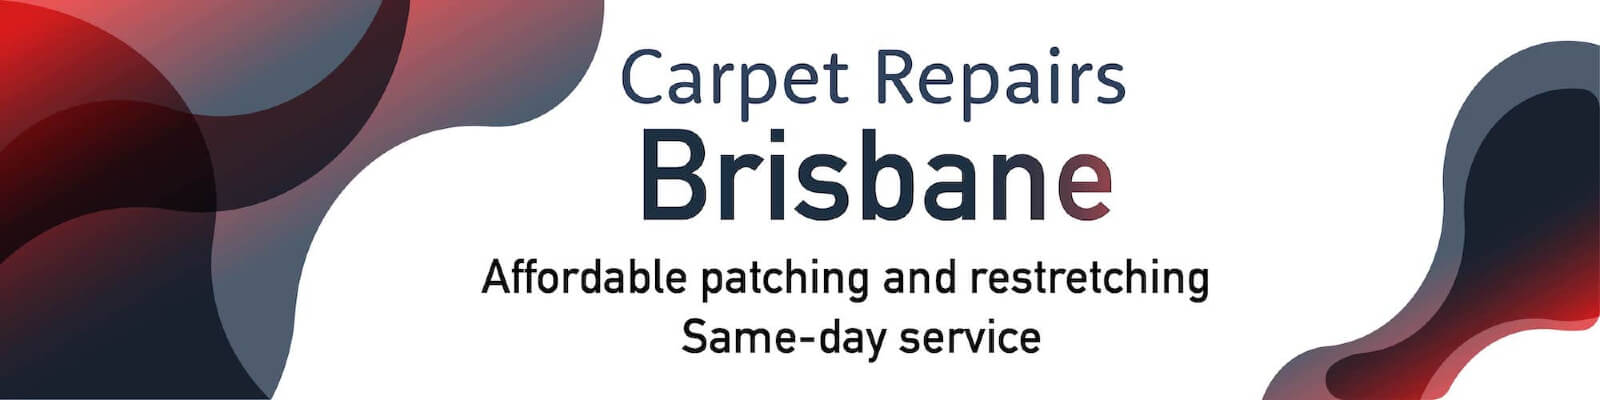 Dazzling Carpet Repairs Brisbane Banner